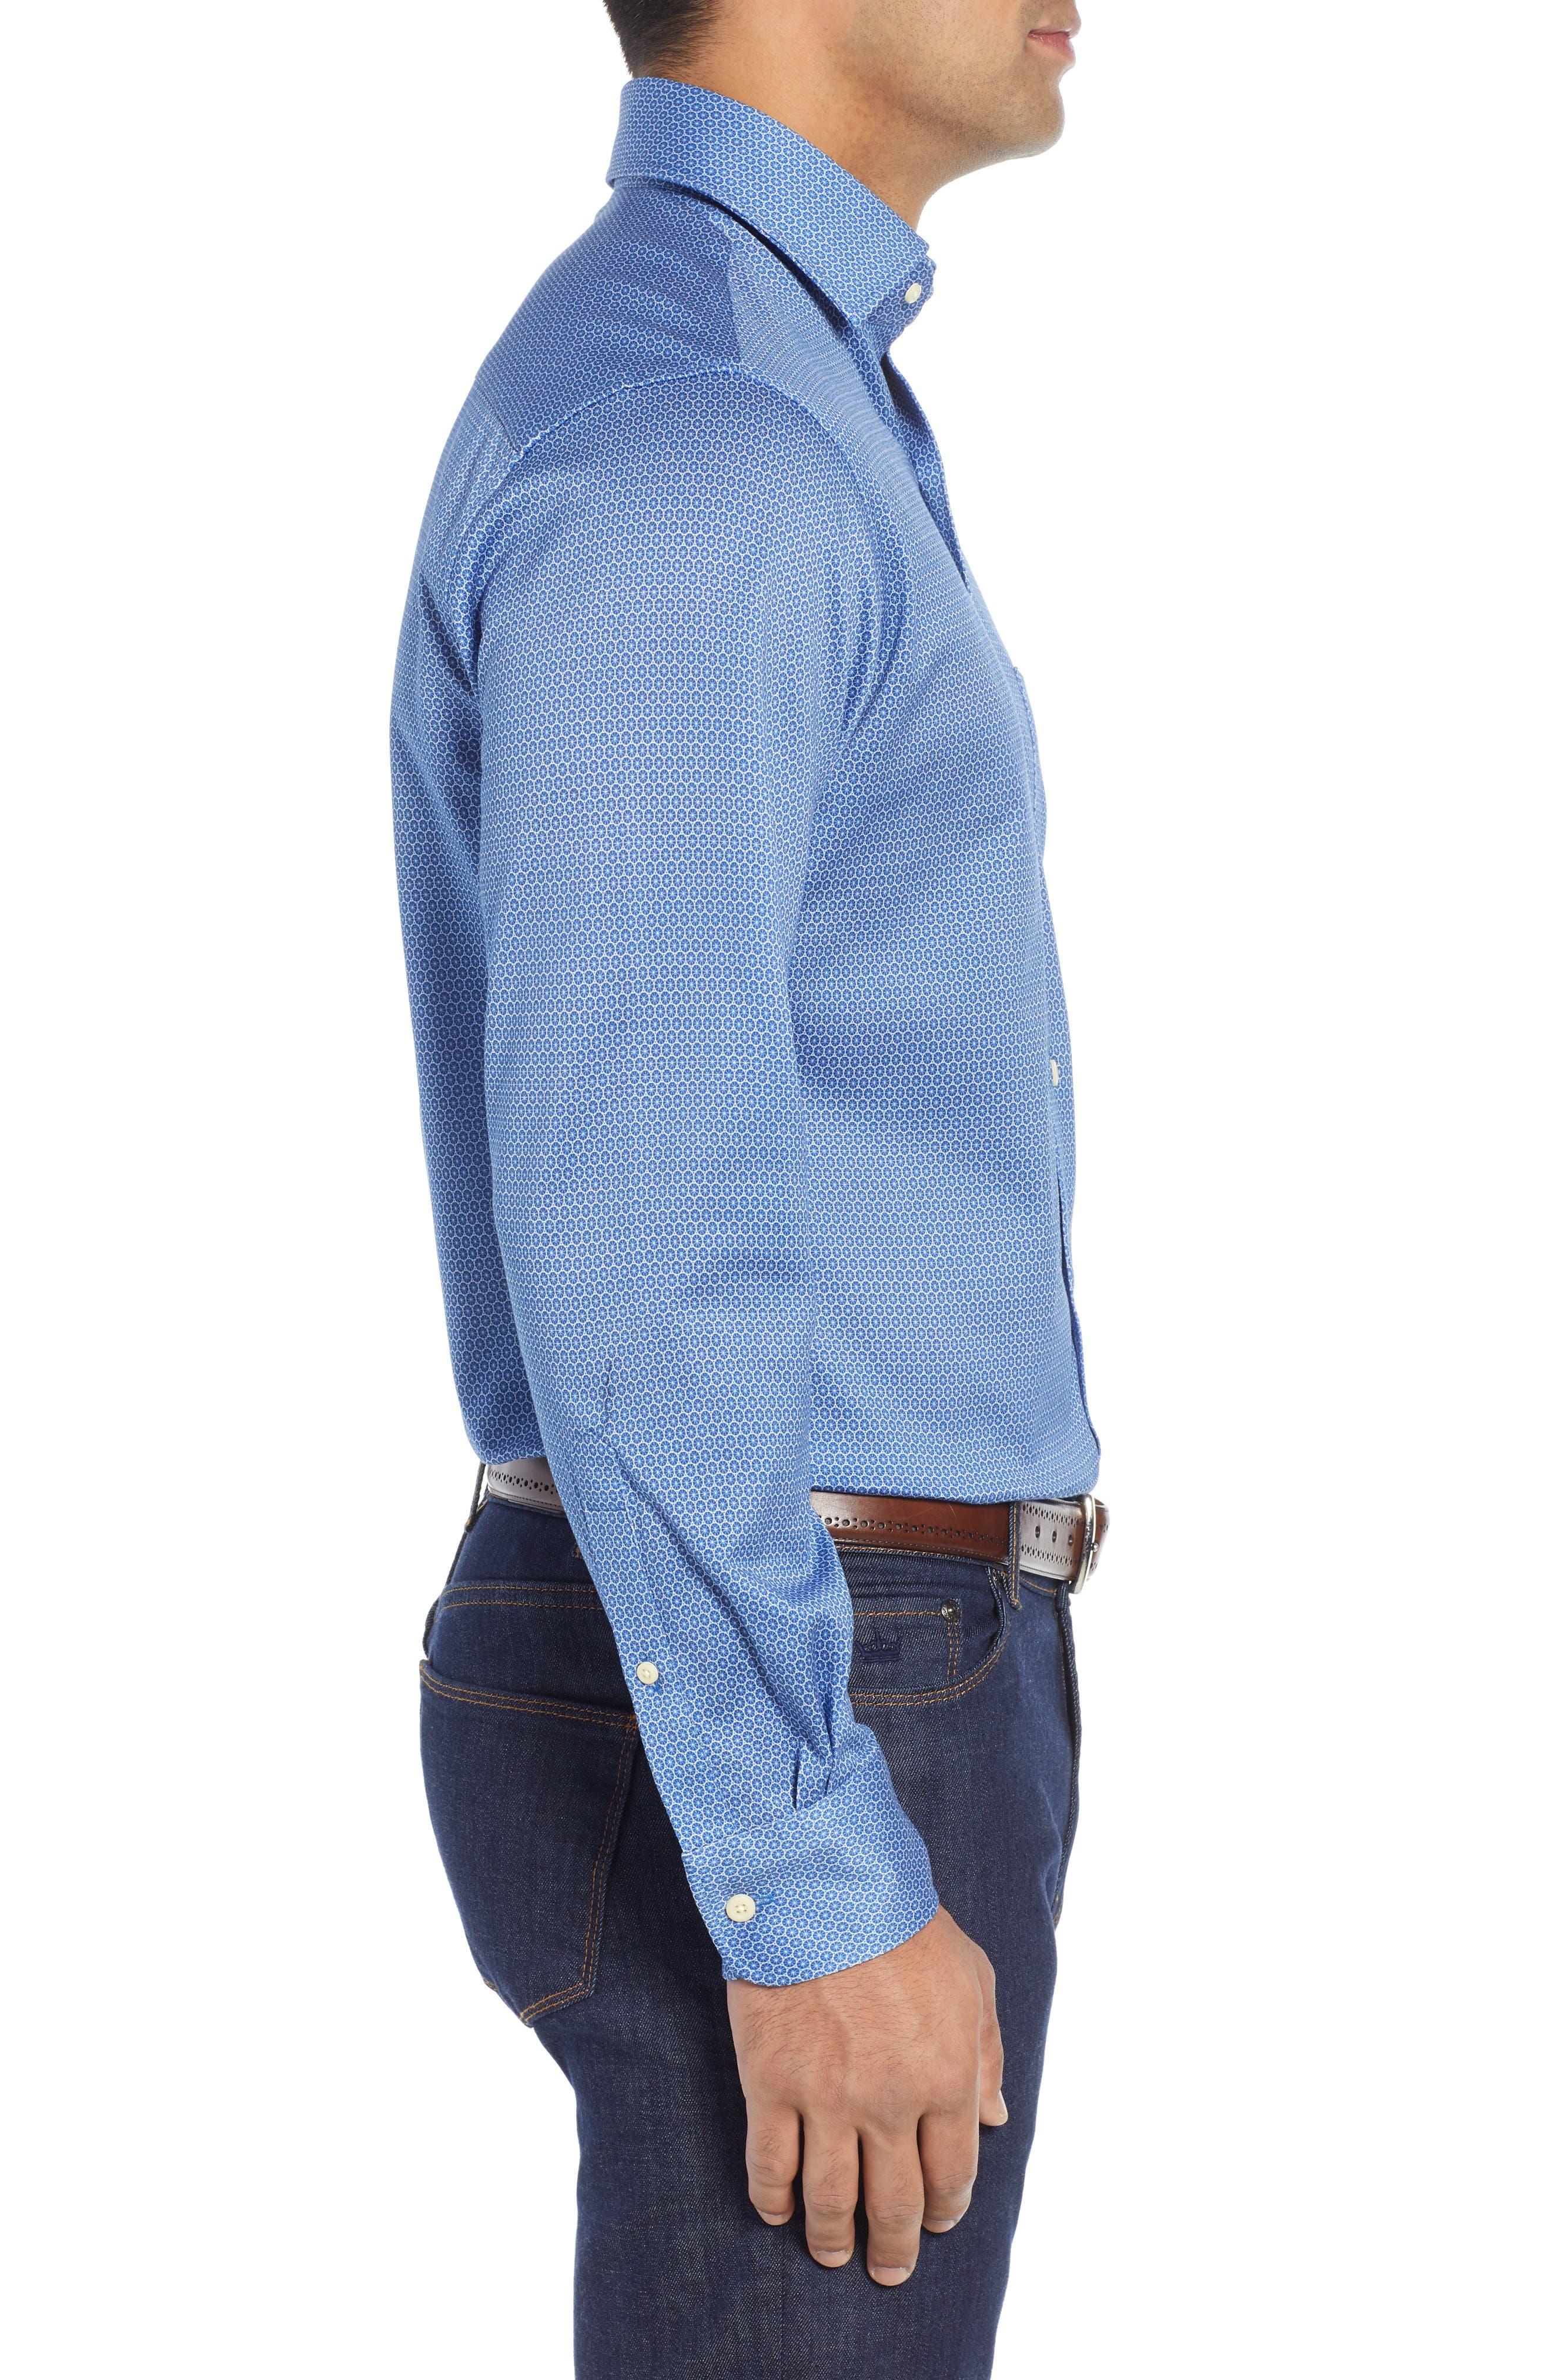 Schwinn Sport Shirt,                             Alternate thumbnail 4, color,                             PLAZA BLUE